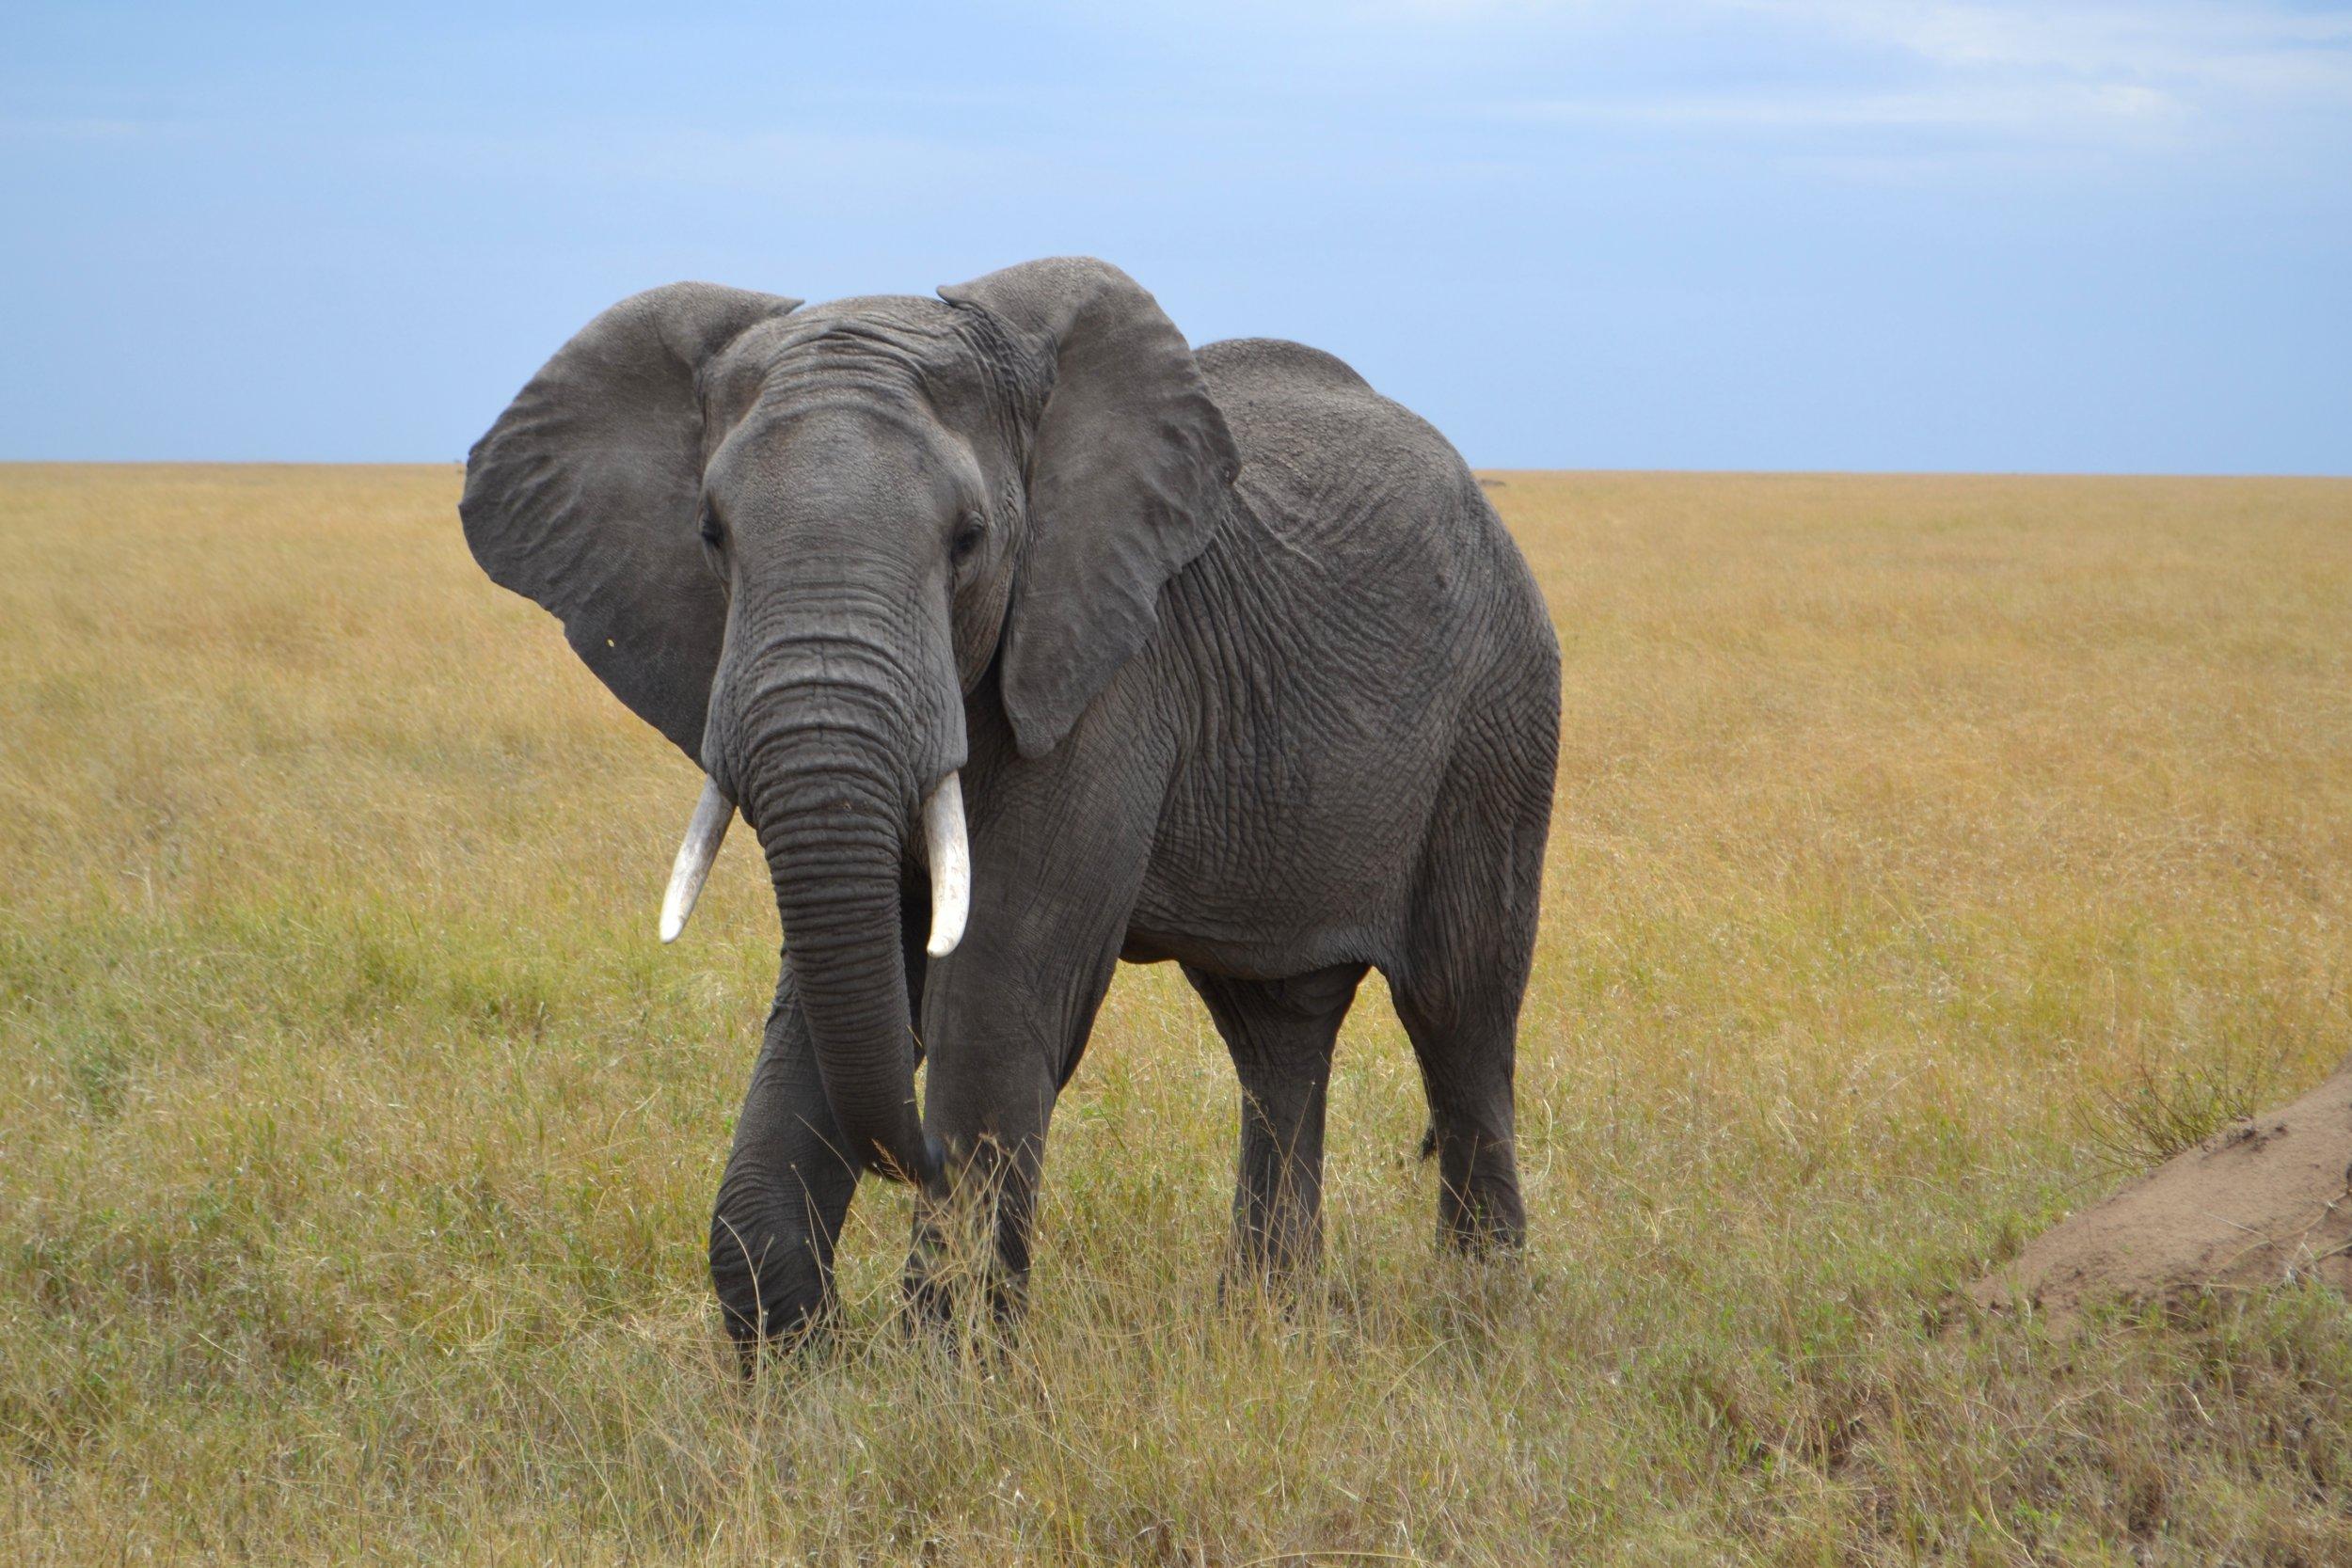 elephant side view